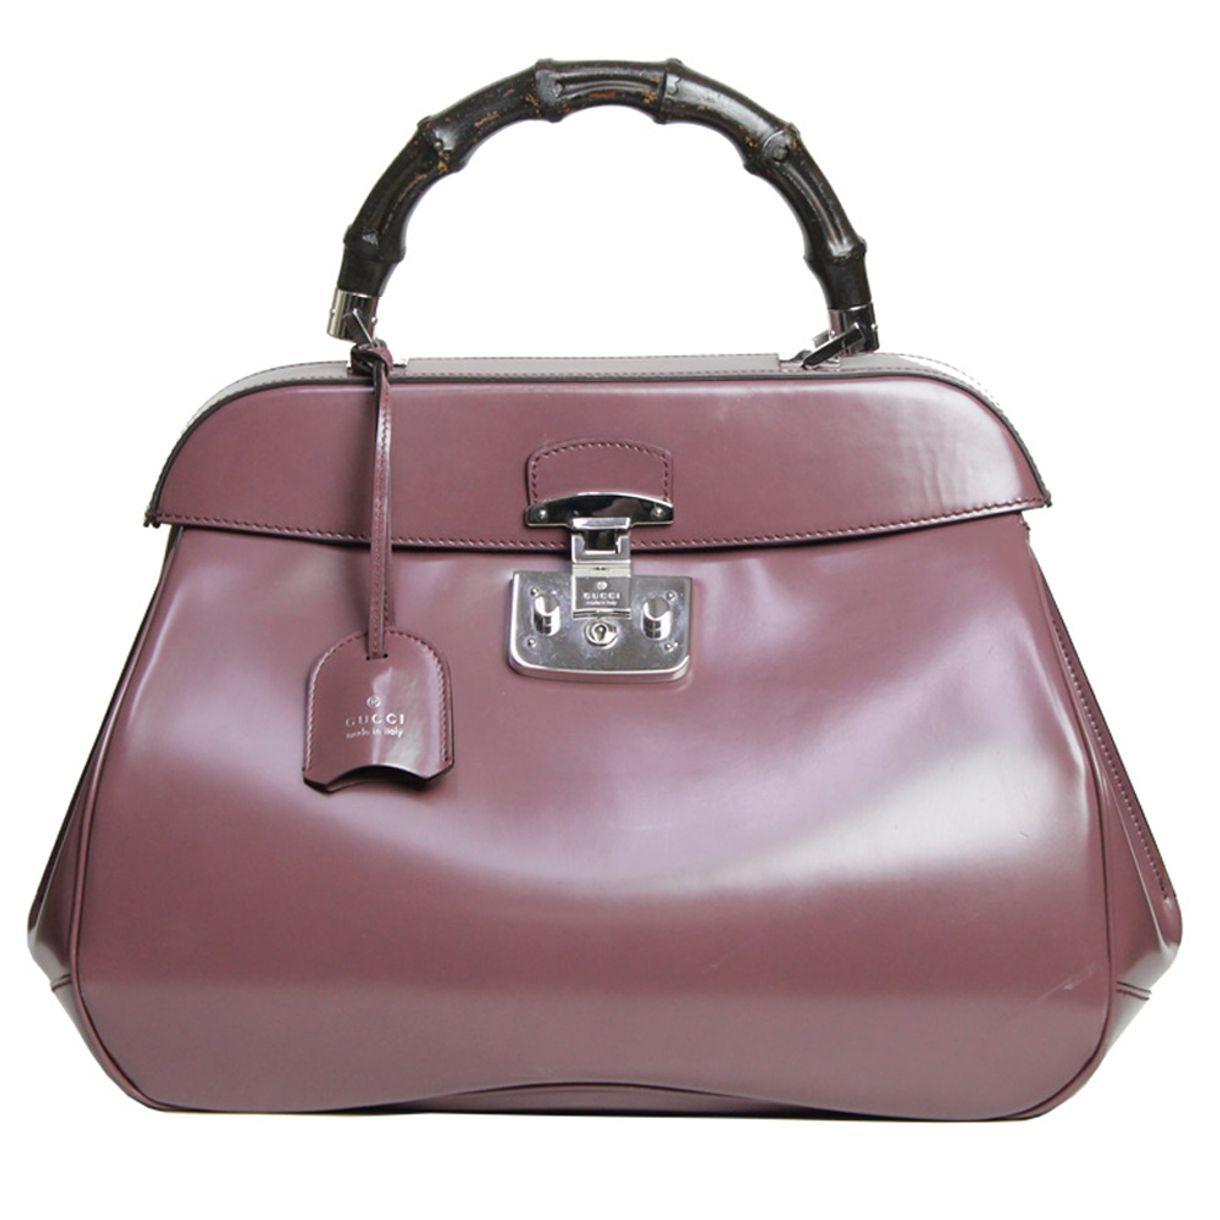 bolsa-gucci-lady-lock-handle-bag-roxa